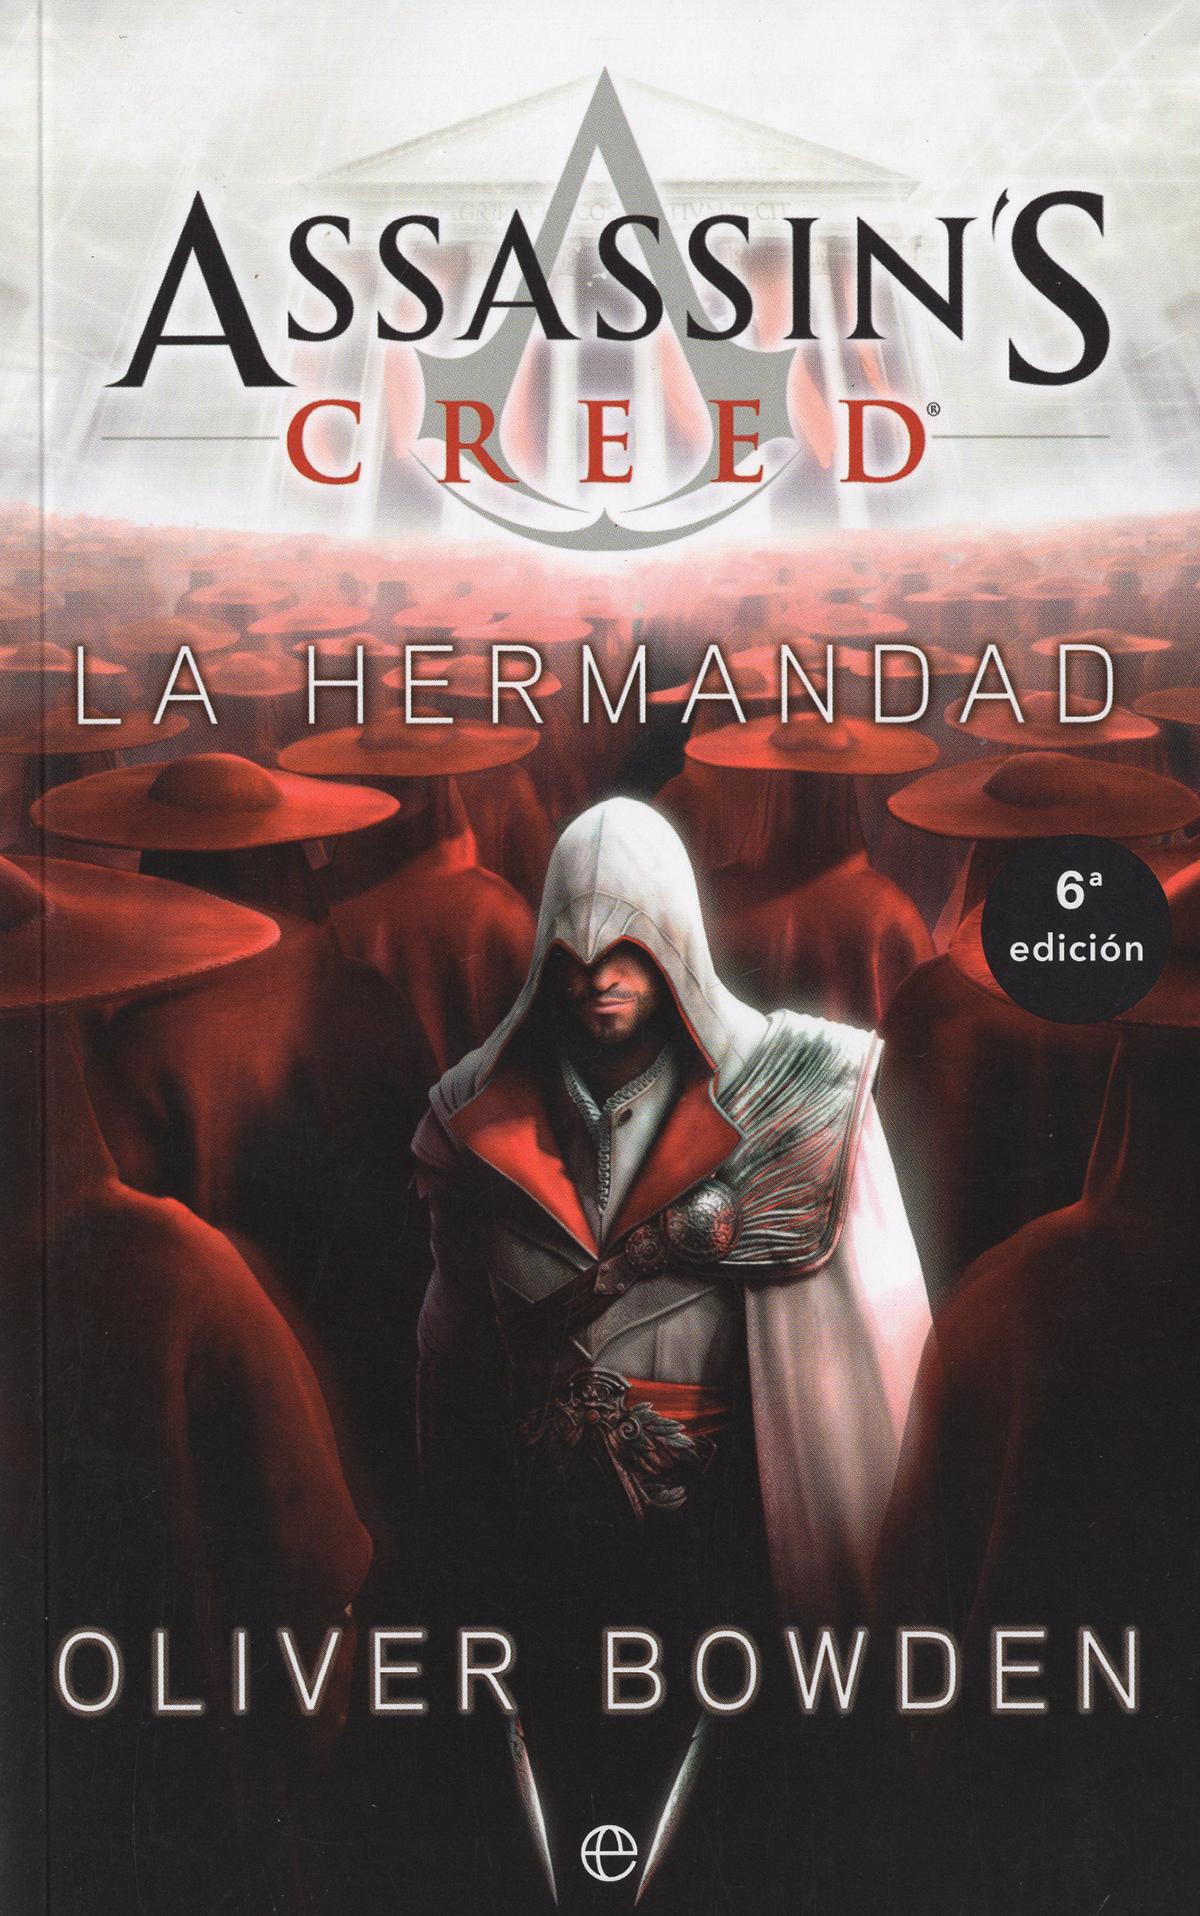 Assassin's creed II. La hermandad (bolsillo)